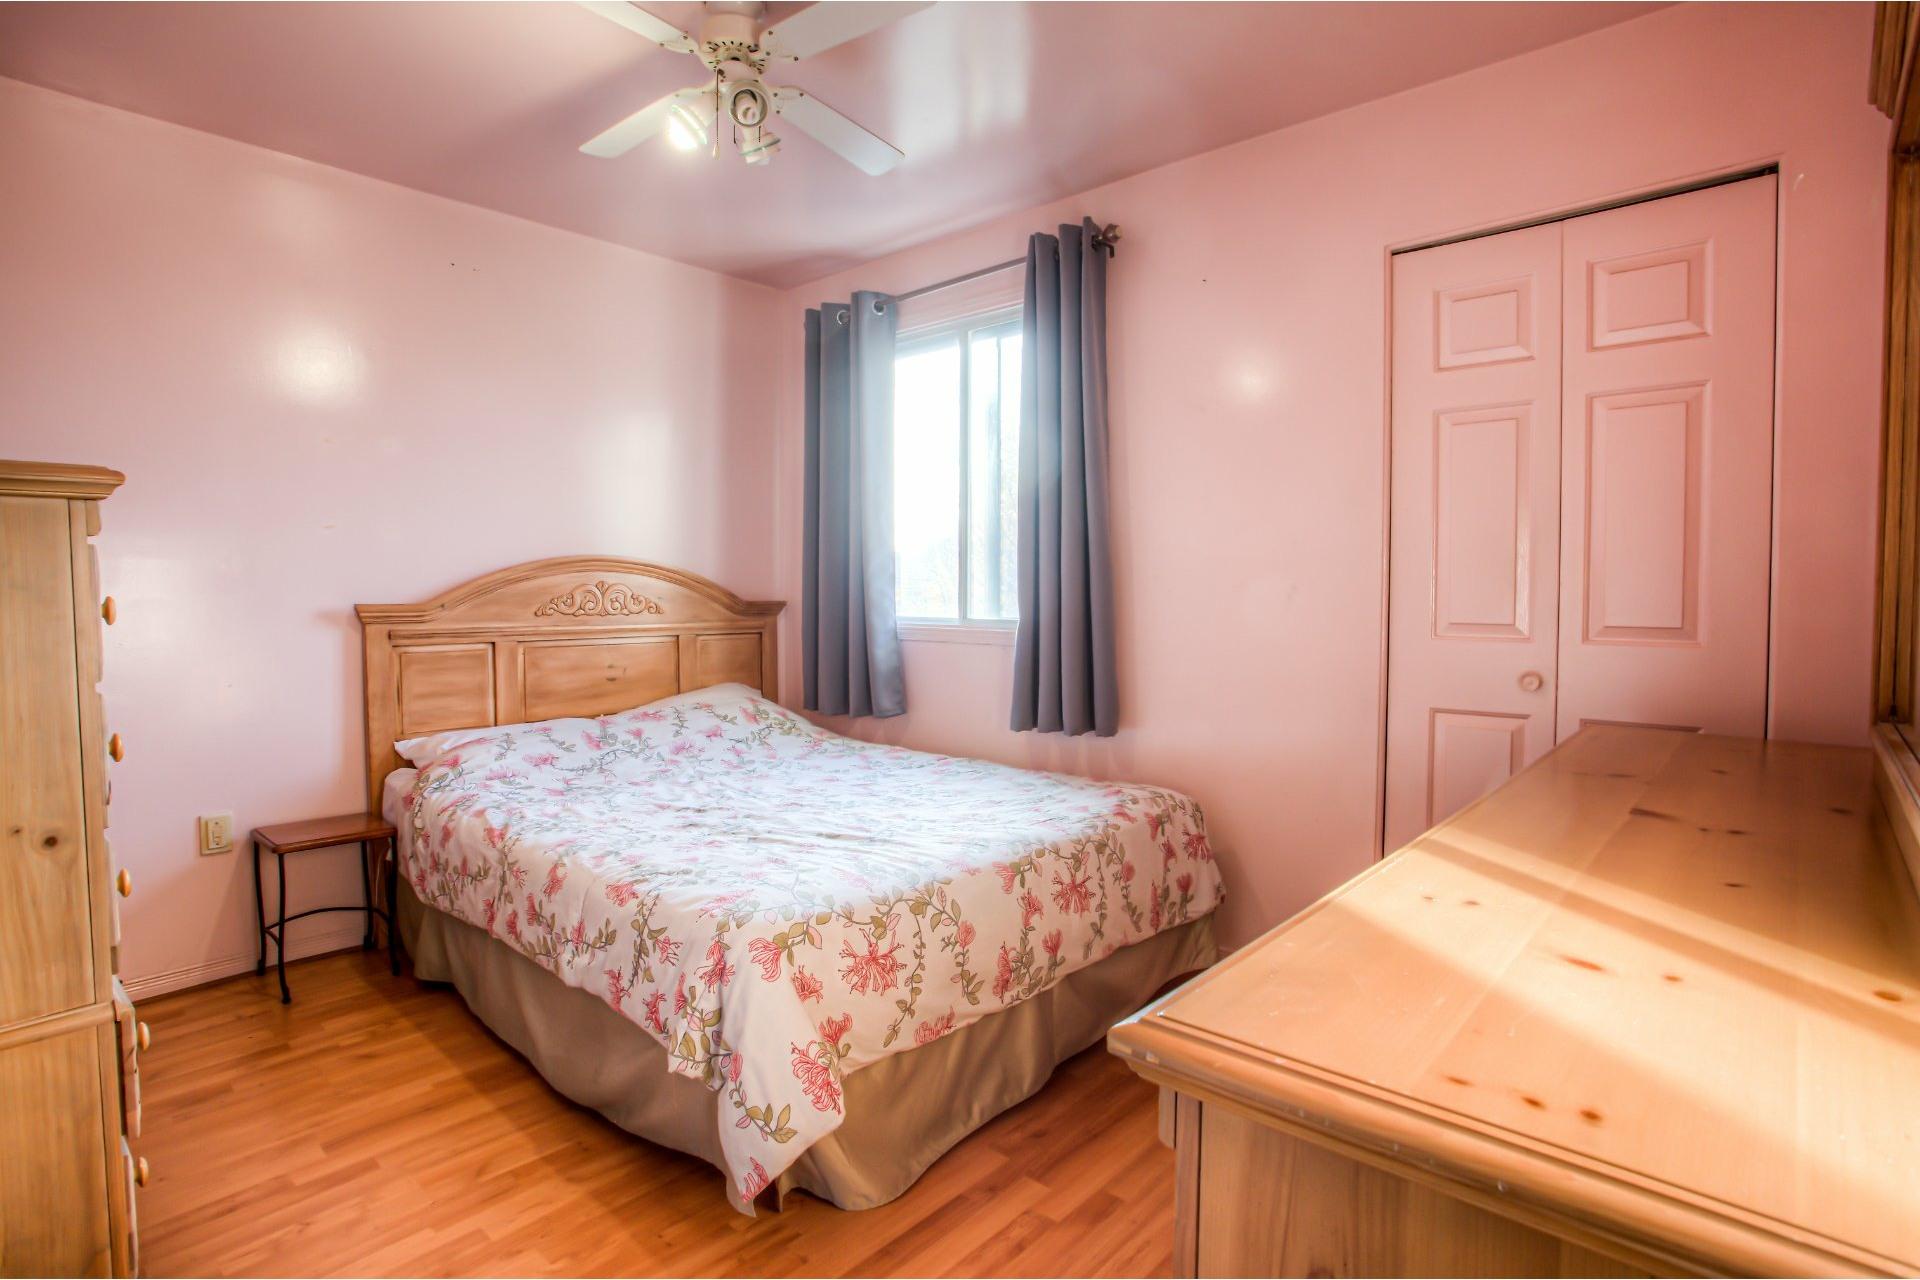 image 19 - House For sale Pierrefonds-Roxboro Montréal  - 8 rooms